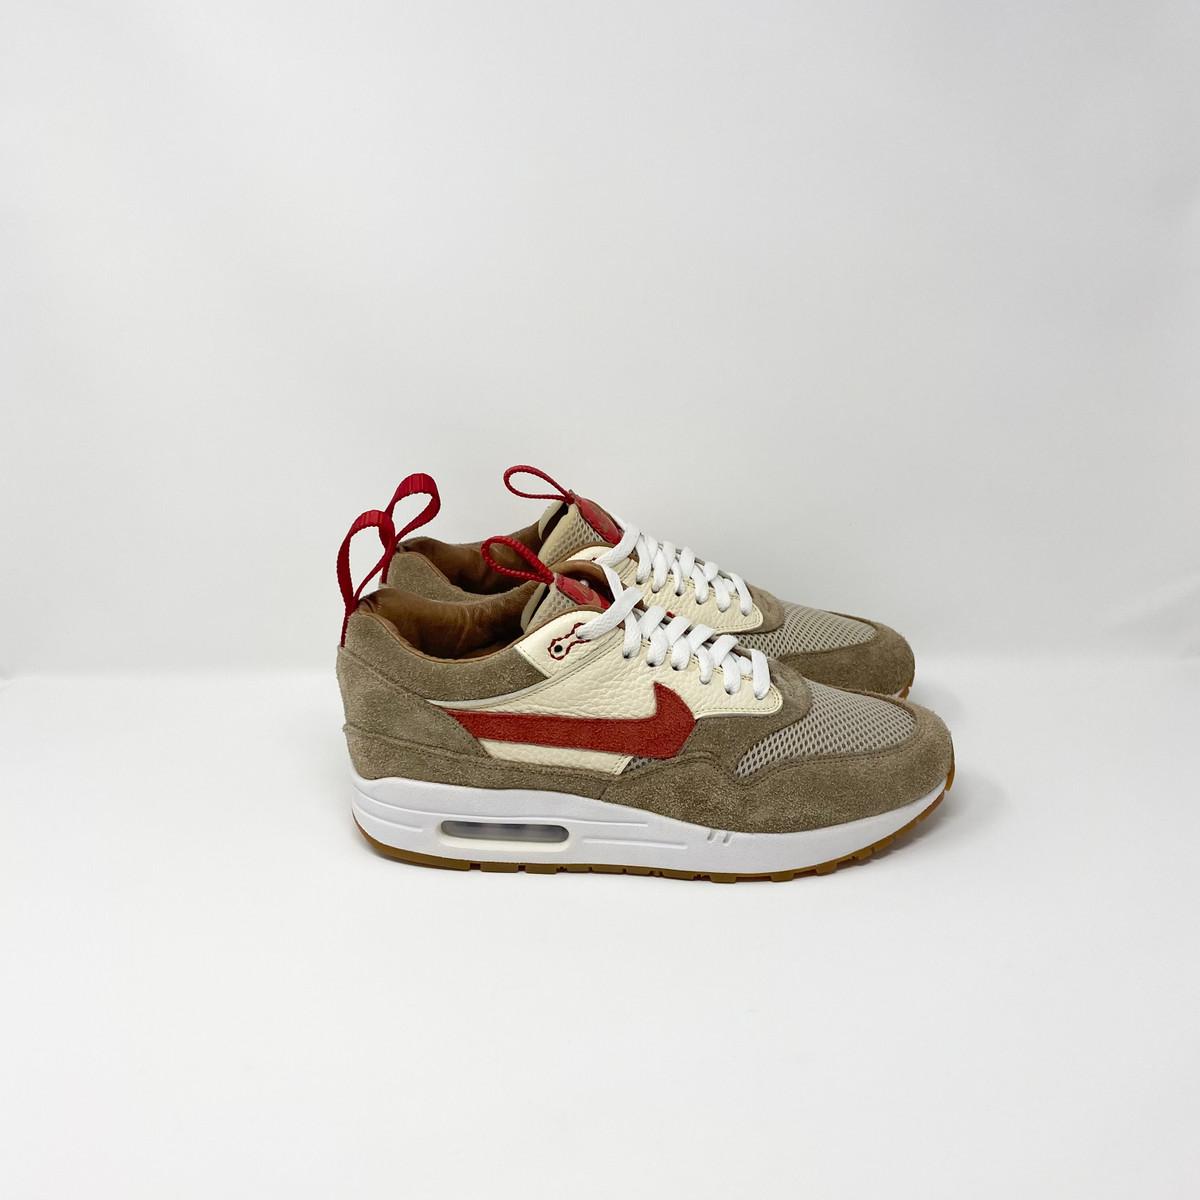 "Nike Air Max 1 ""Mars Yard"" by Chase Shiel"